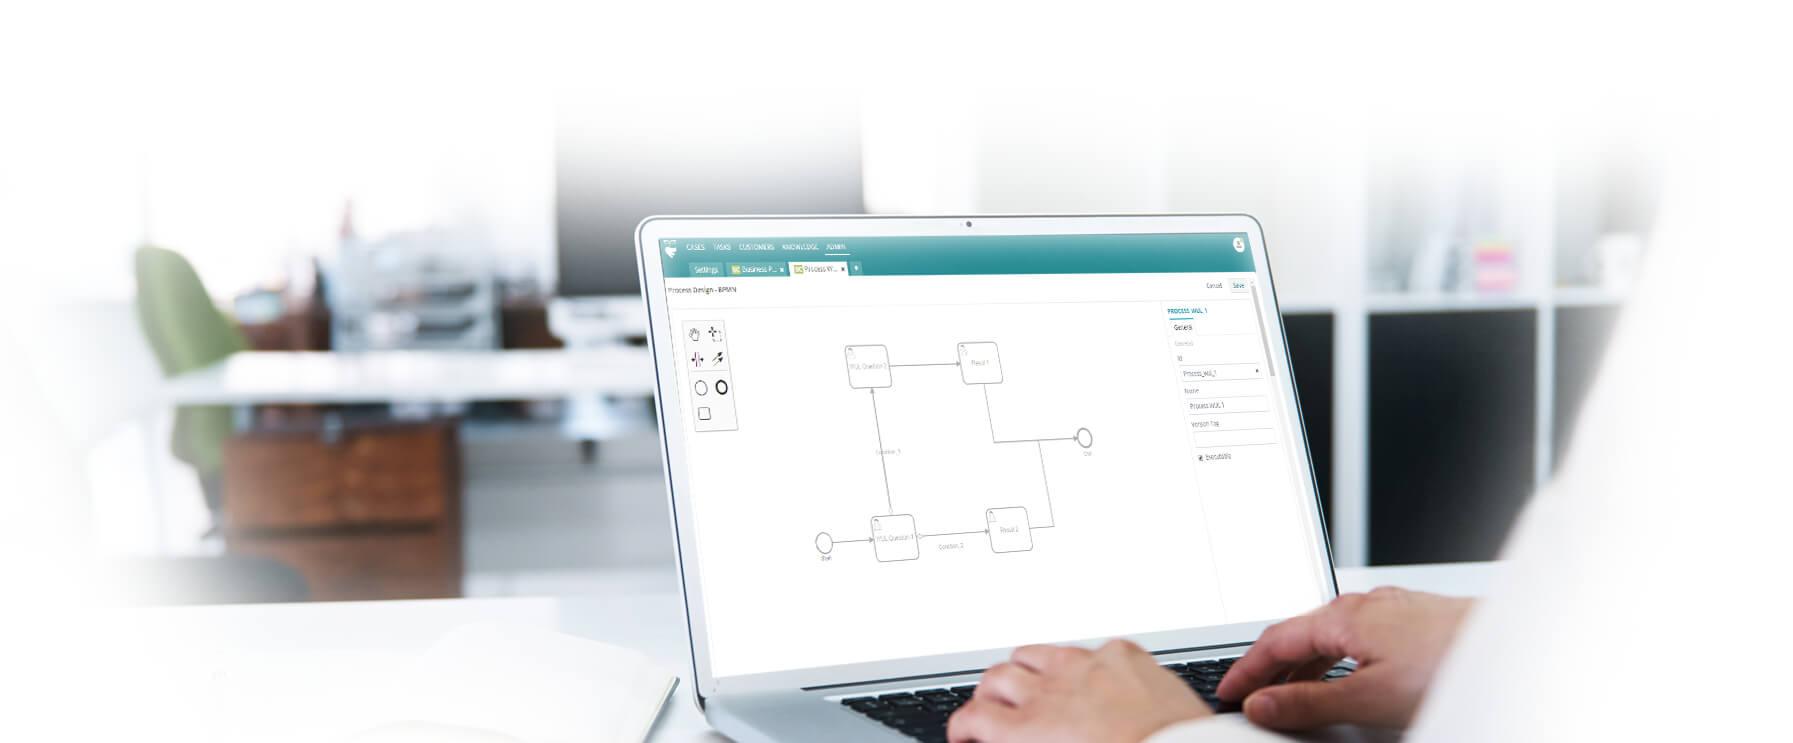 Helpdesk Case Automation with BPMN